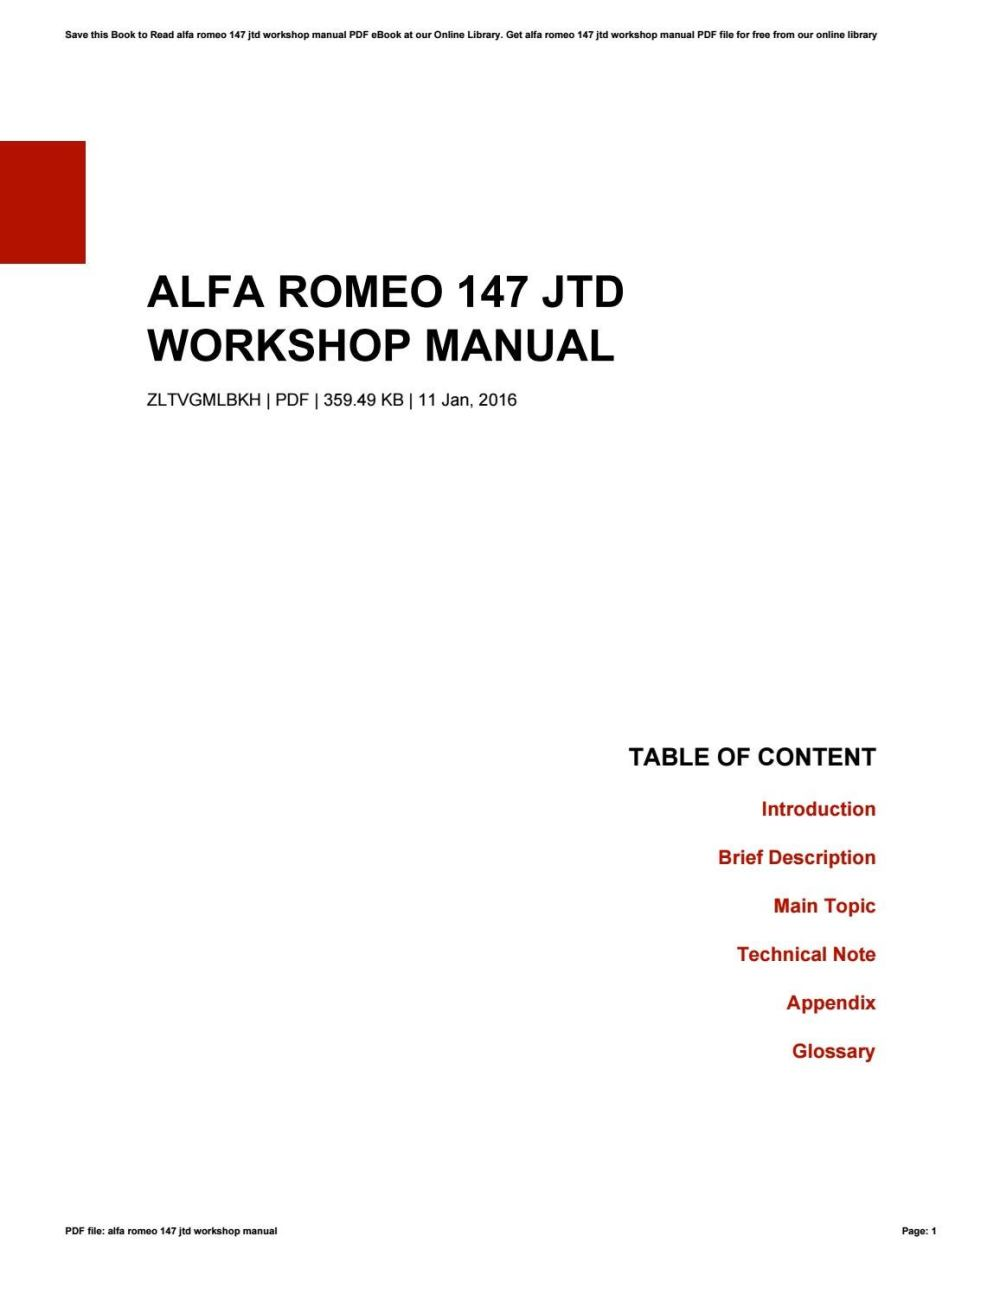 medium resolution of alfa romeo 147 manual free download wiring library alfa romeo 147 jtd wiring diagram